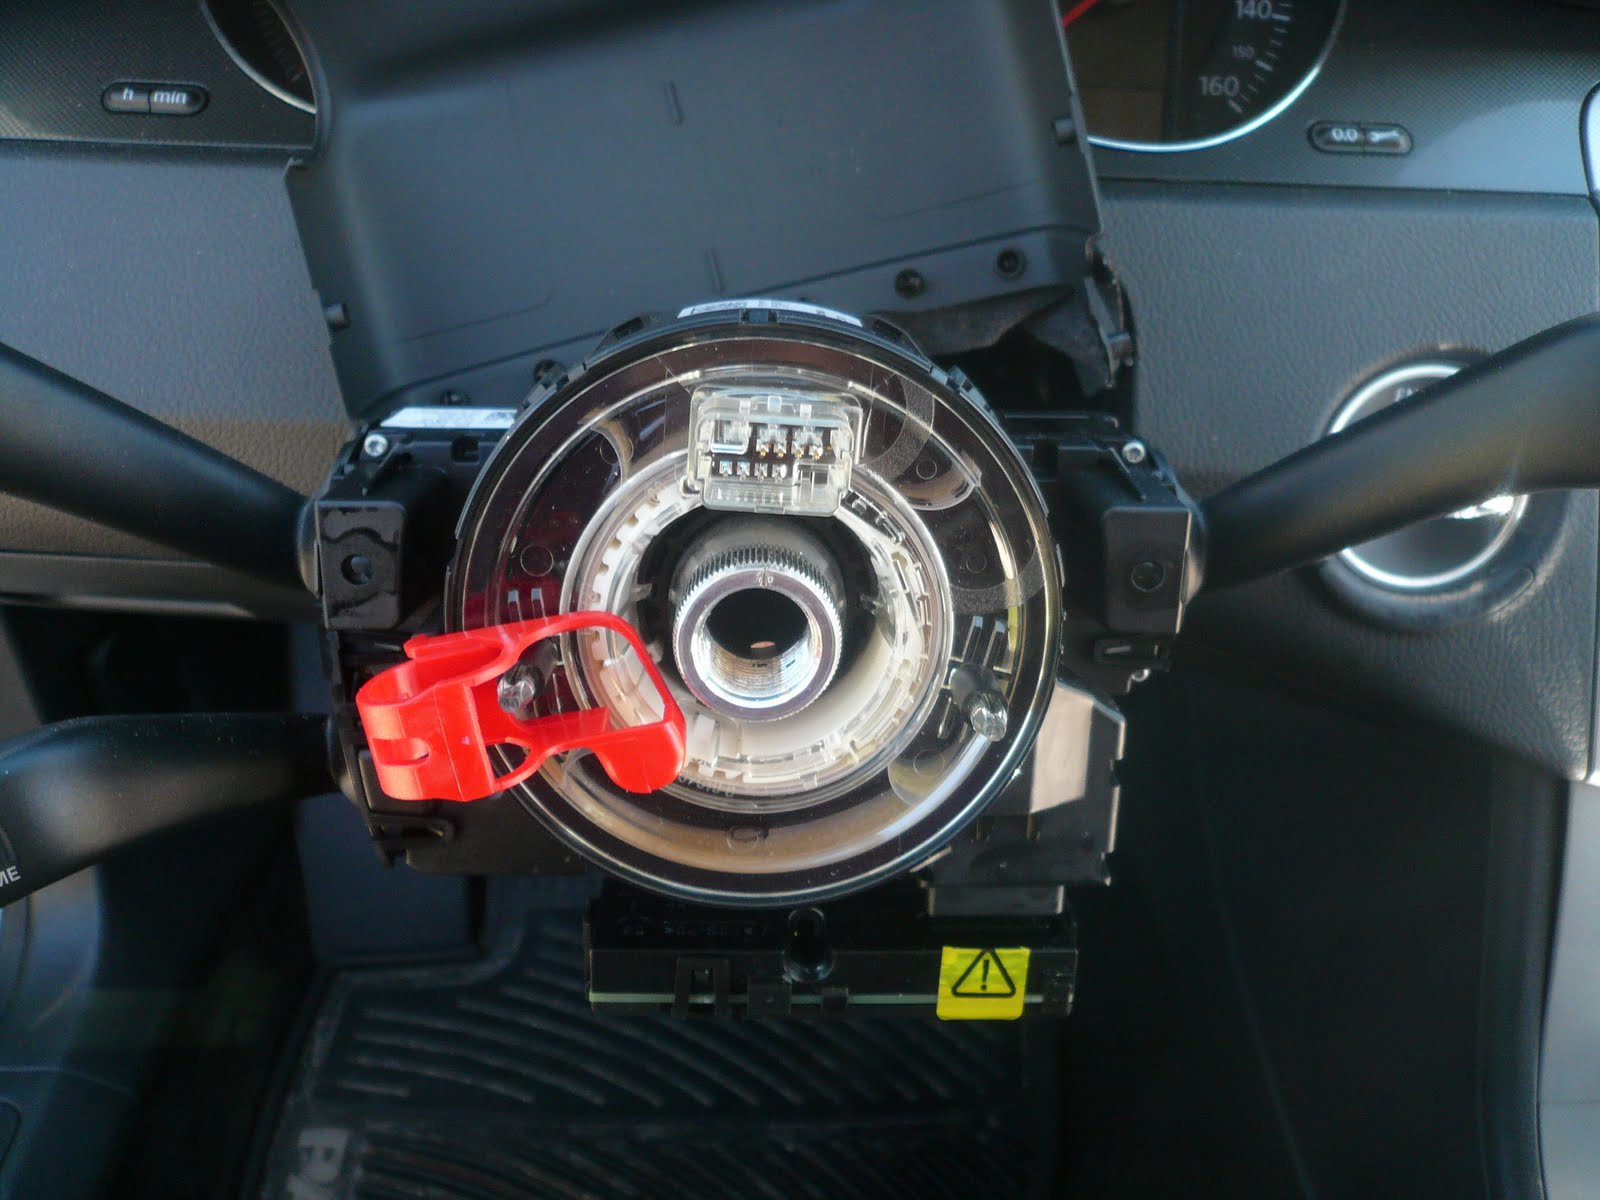 VW Passat Repair: How to replace the Steering Wheel ...